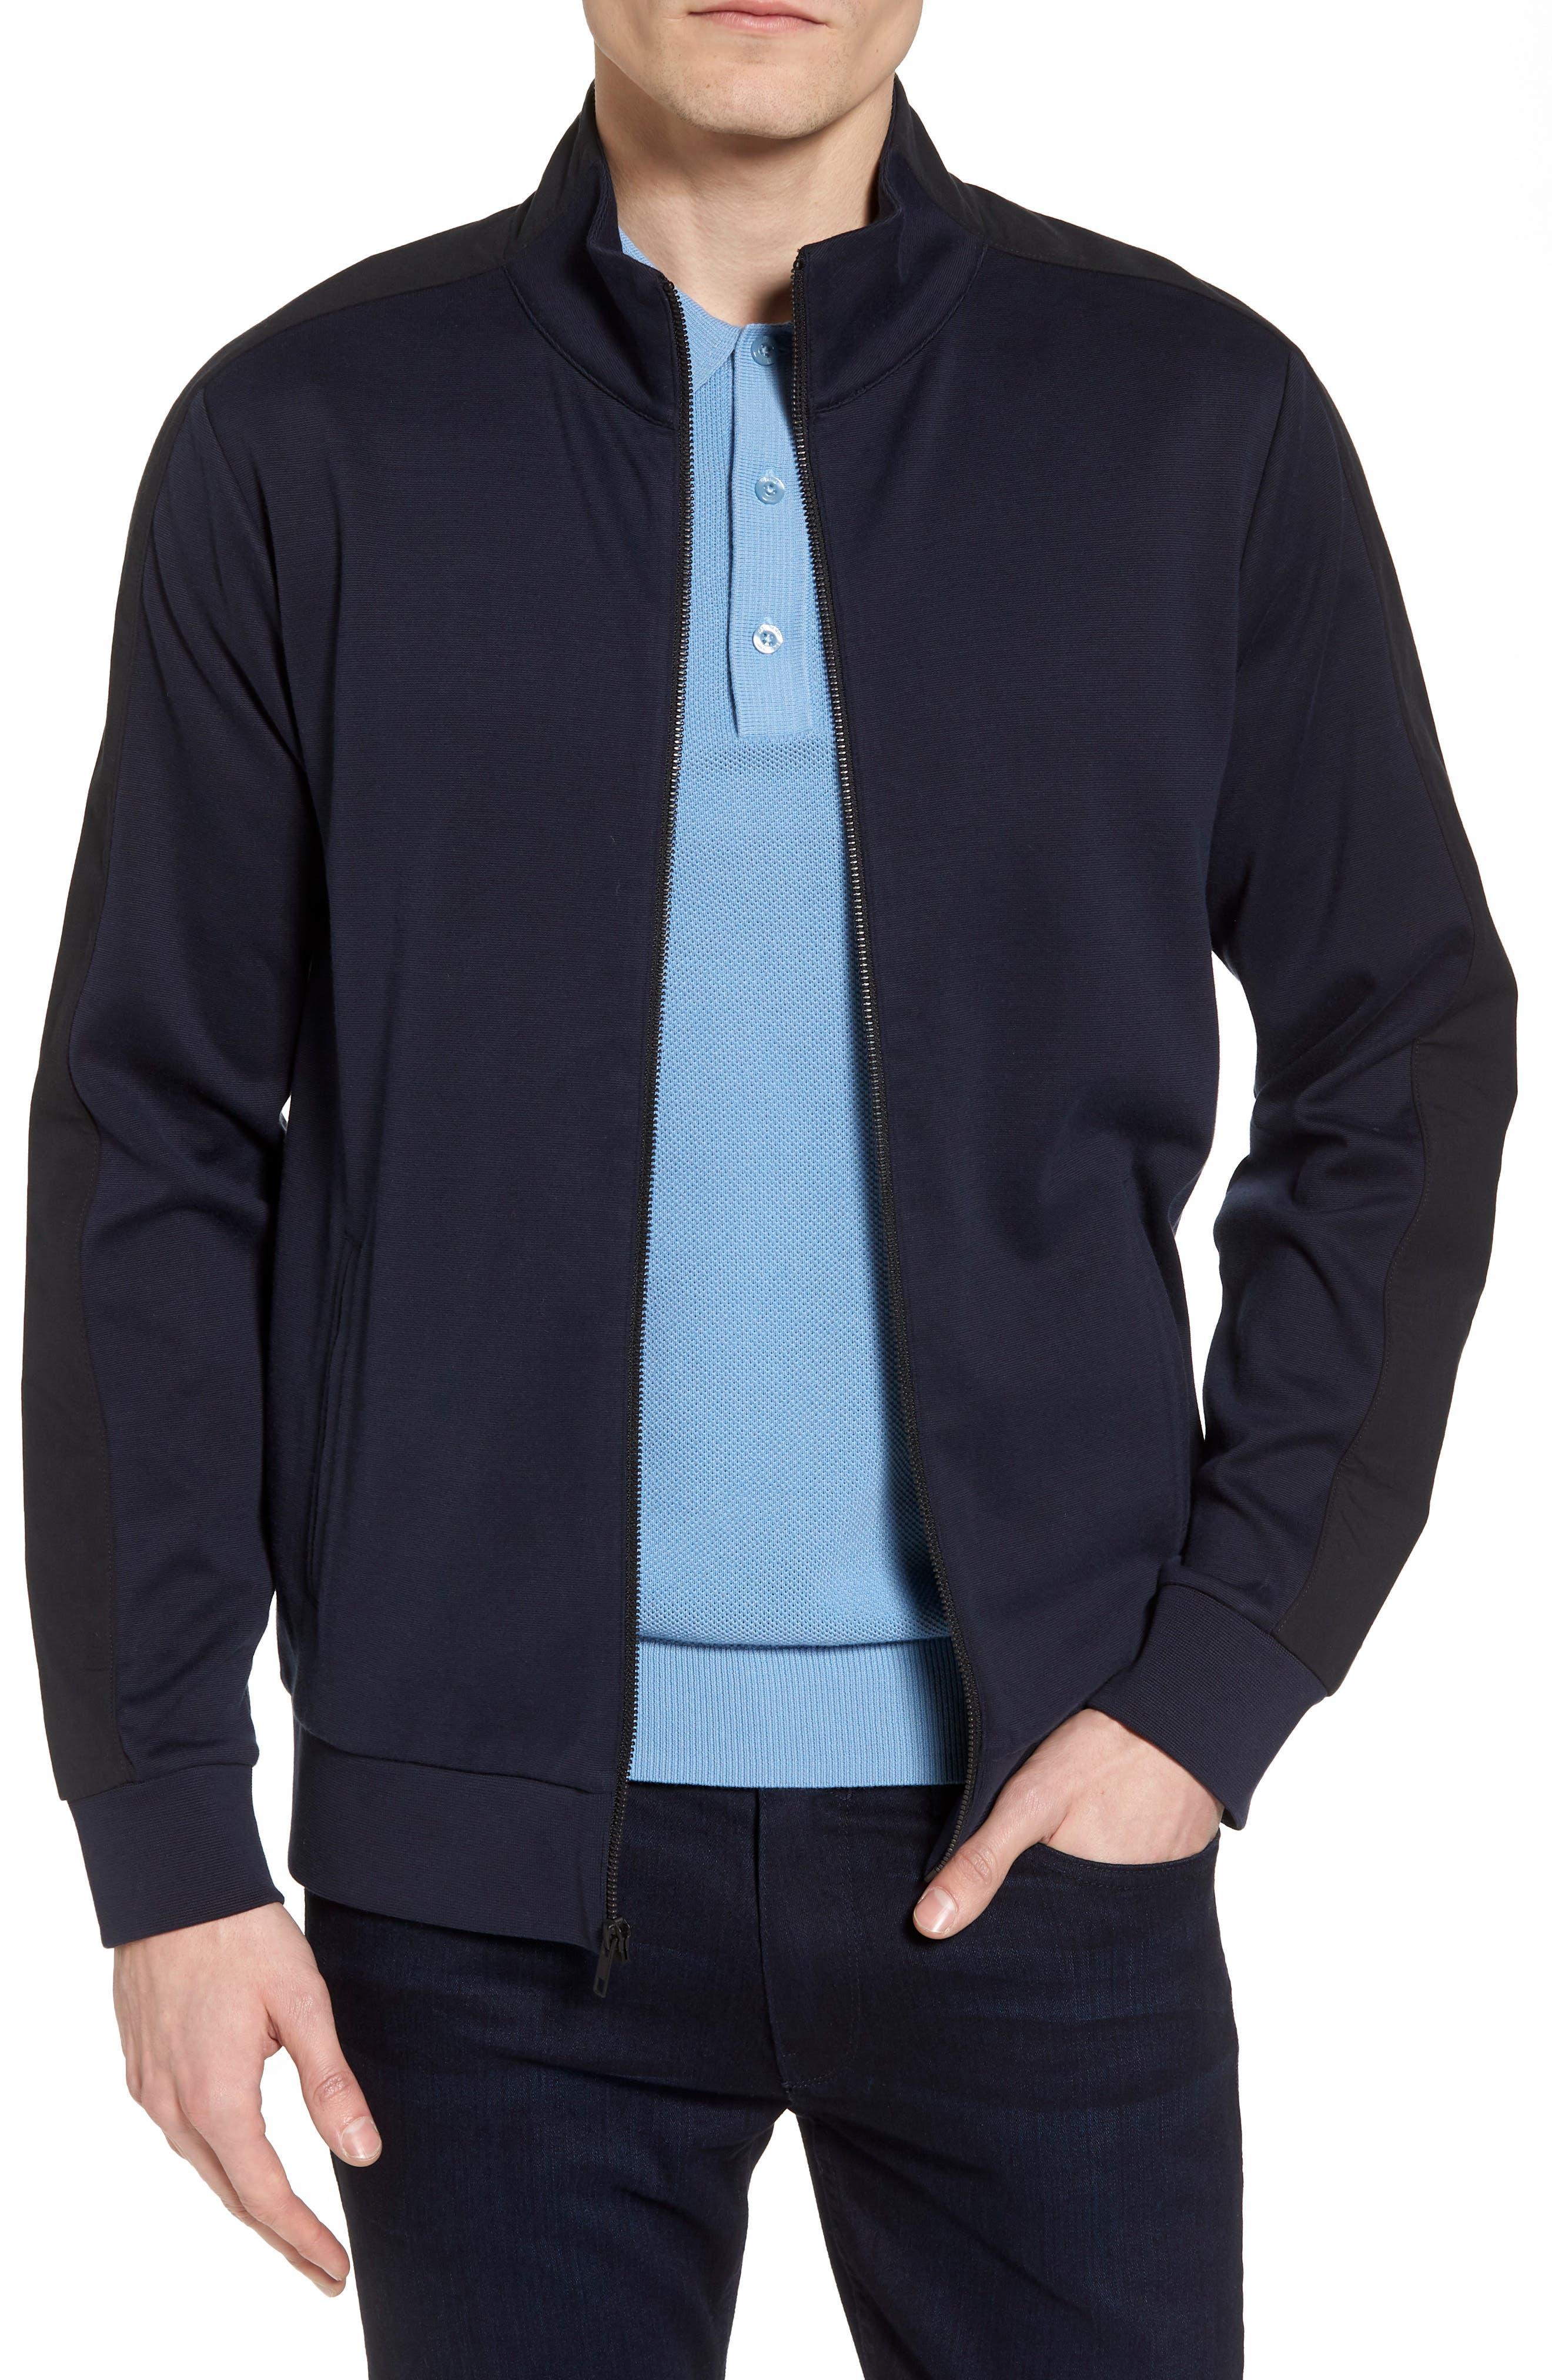 Fleece Jacket,                             Main thumbnail 1, color,                             Navy Night Black